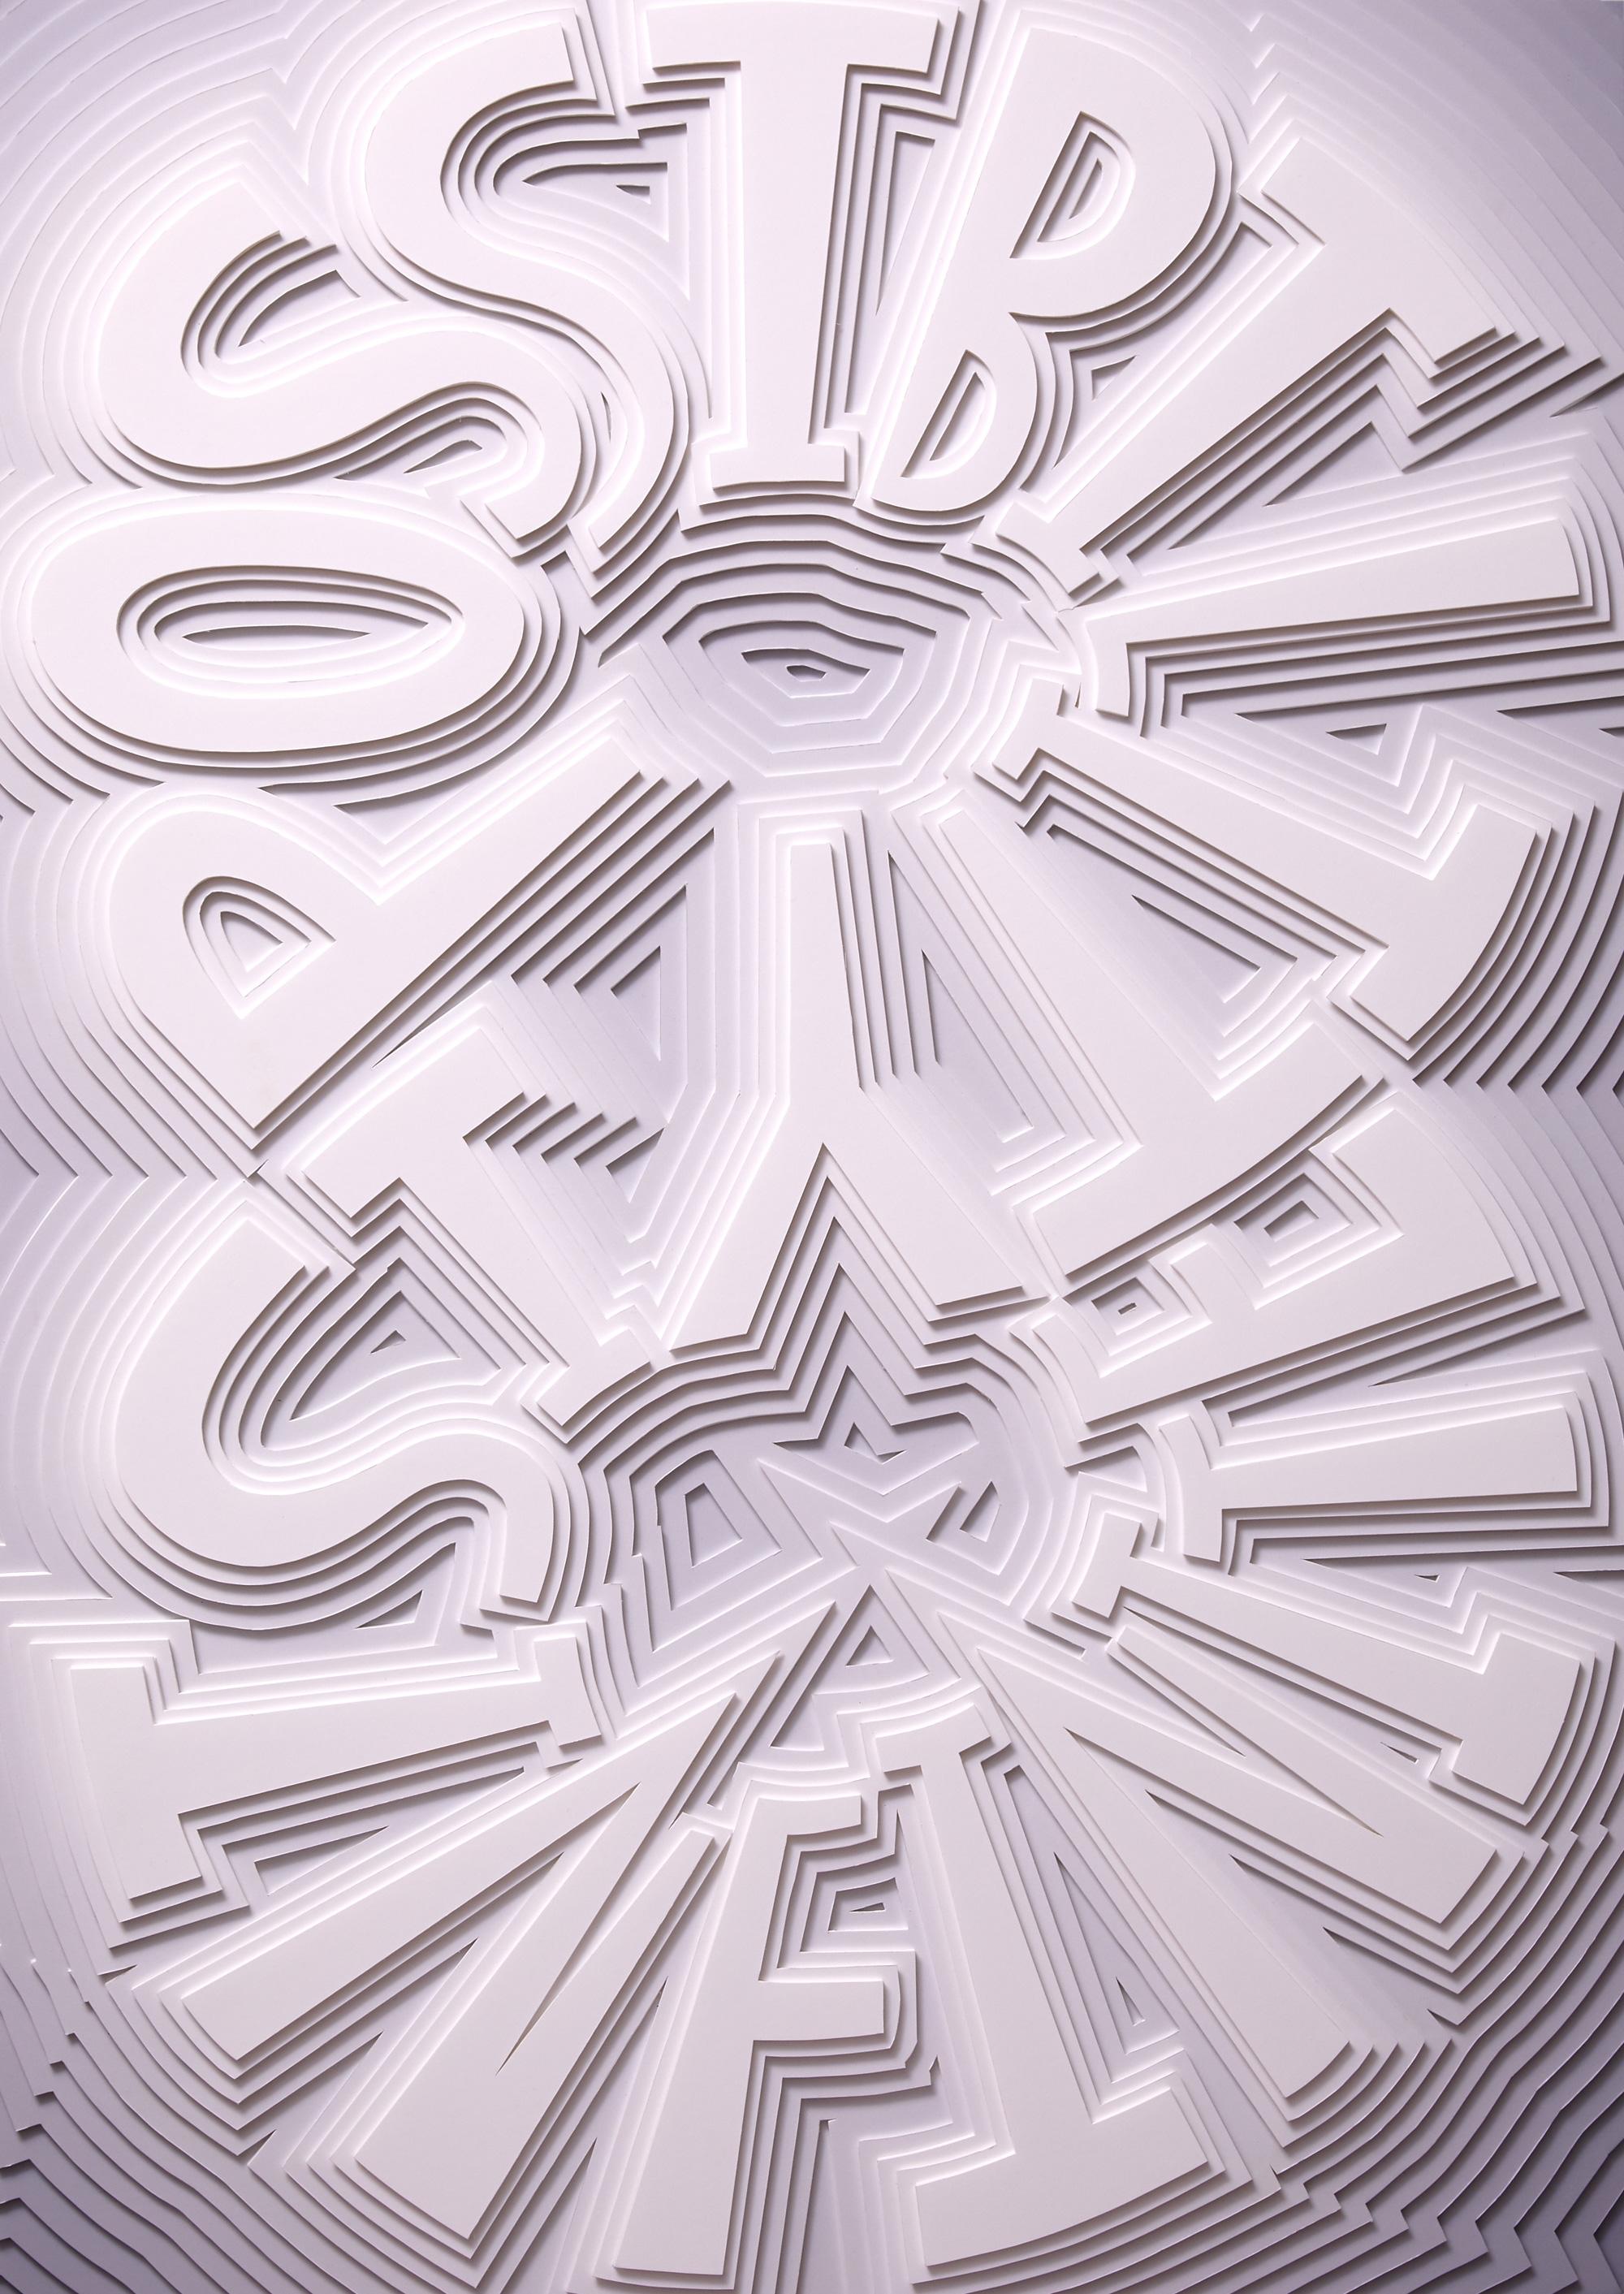 Possibility is Infinite by Hideto Yagi